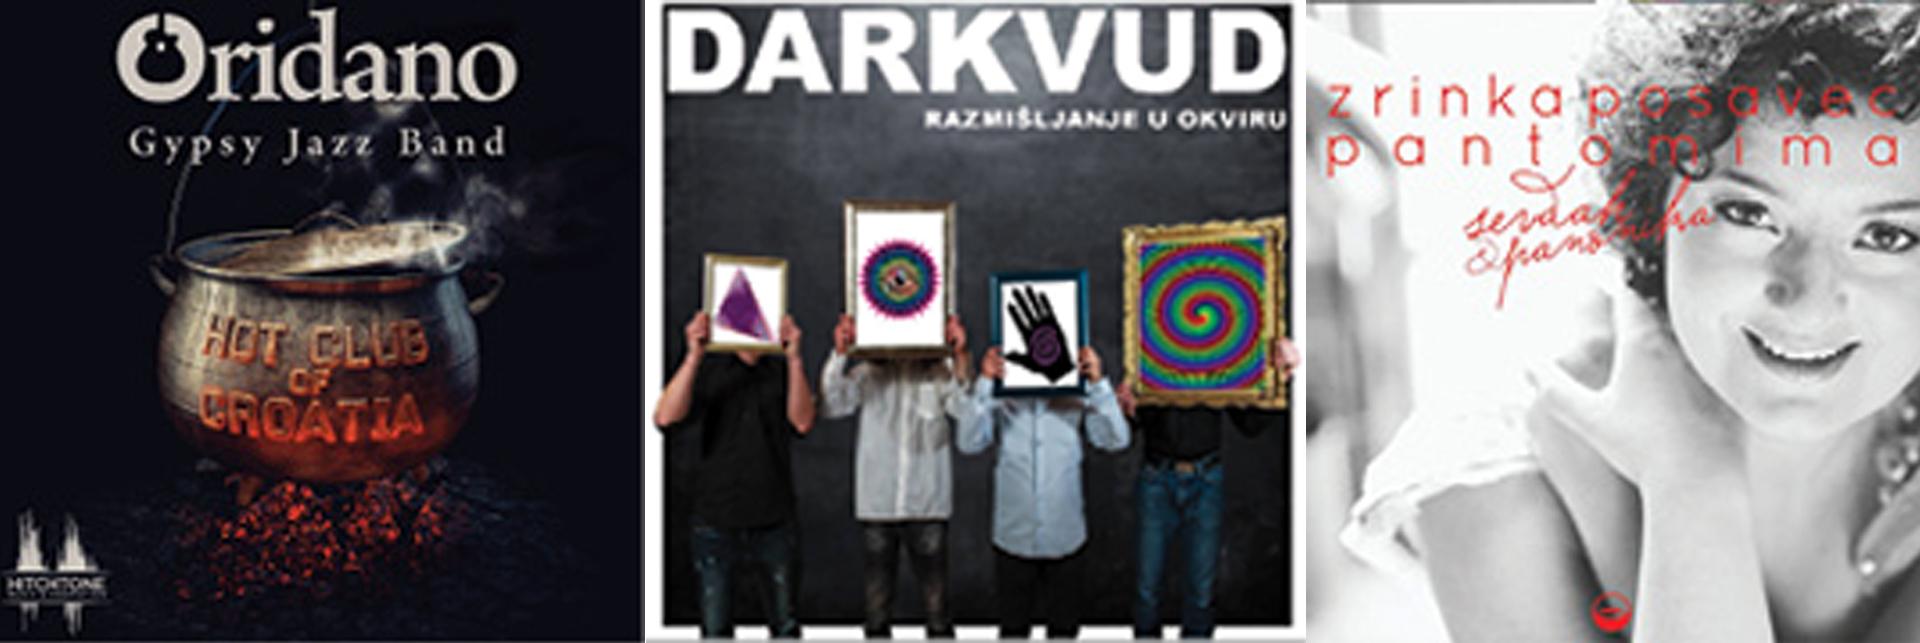 GLAZBENE RECENZIJE : Oridano Gipsy Jazz Band, Darkvud, Zrinka Posavec